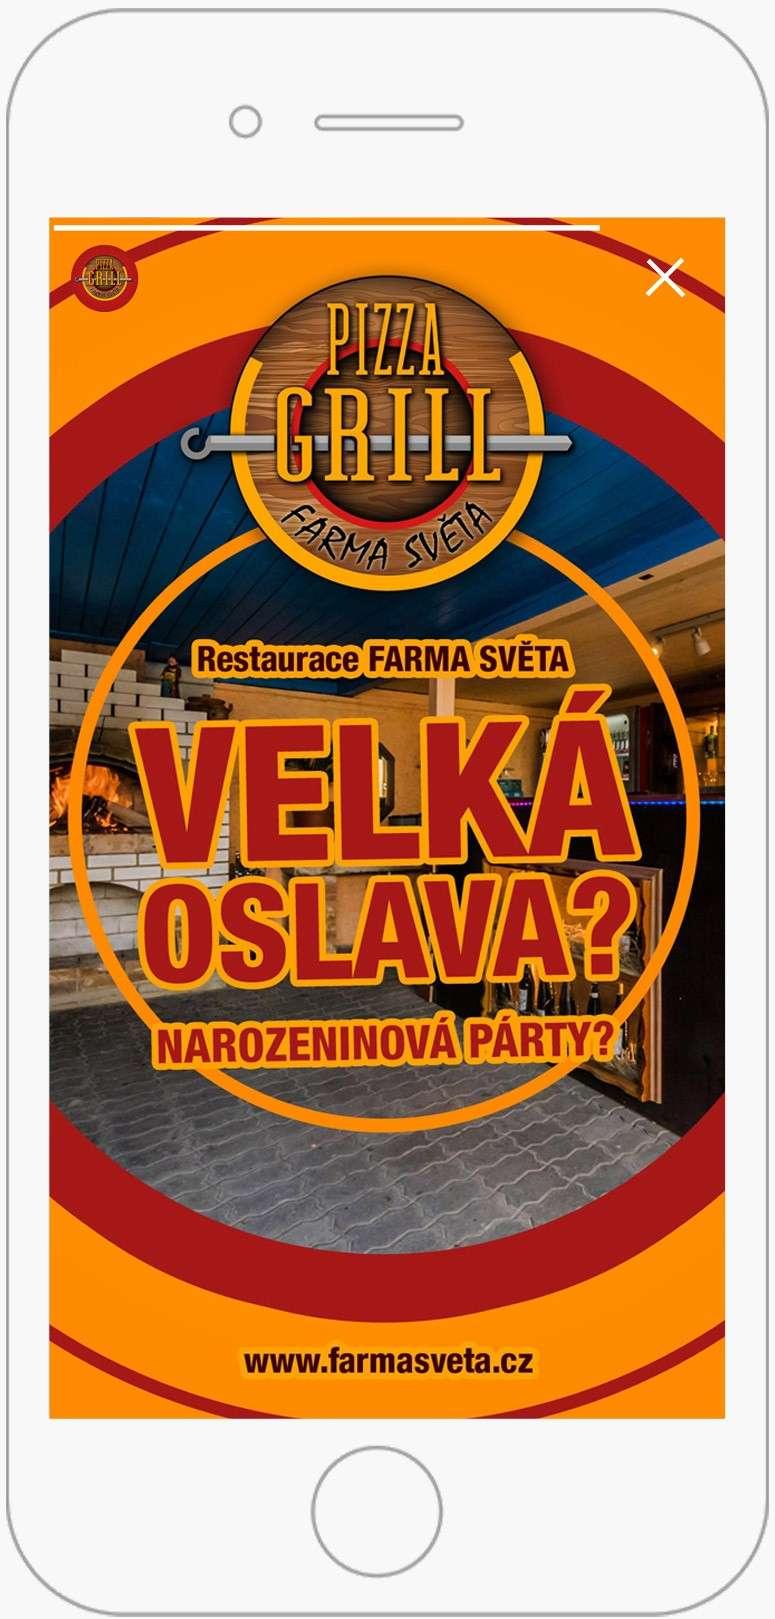 clubadvisor_reference_pizzagrillfarmasveta_on-line-marketing_instagram-single2